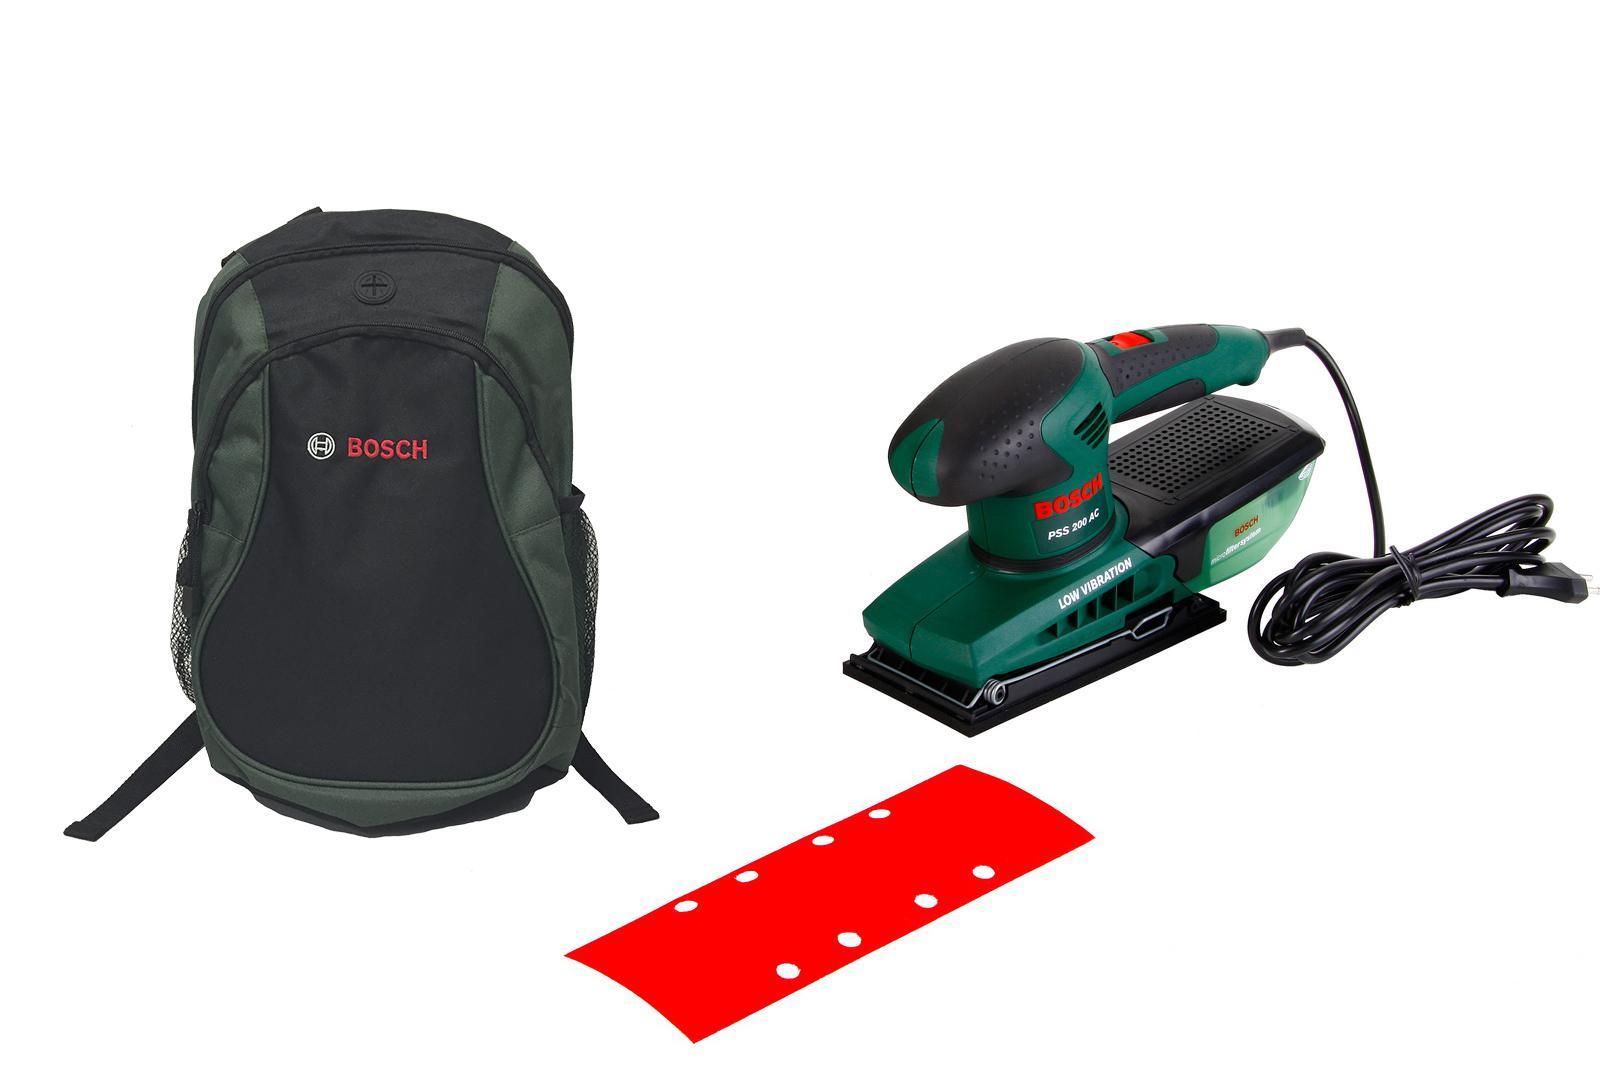 Набор Bosch шлиф.машинка плоская pss 200 ac (0603340120) + рюкзак green (1619g45200) вибрационная шлифмашина bosch pss 200 ac 0603340120